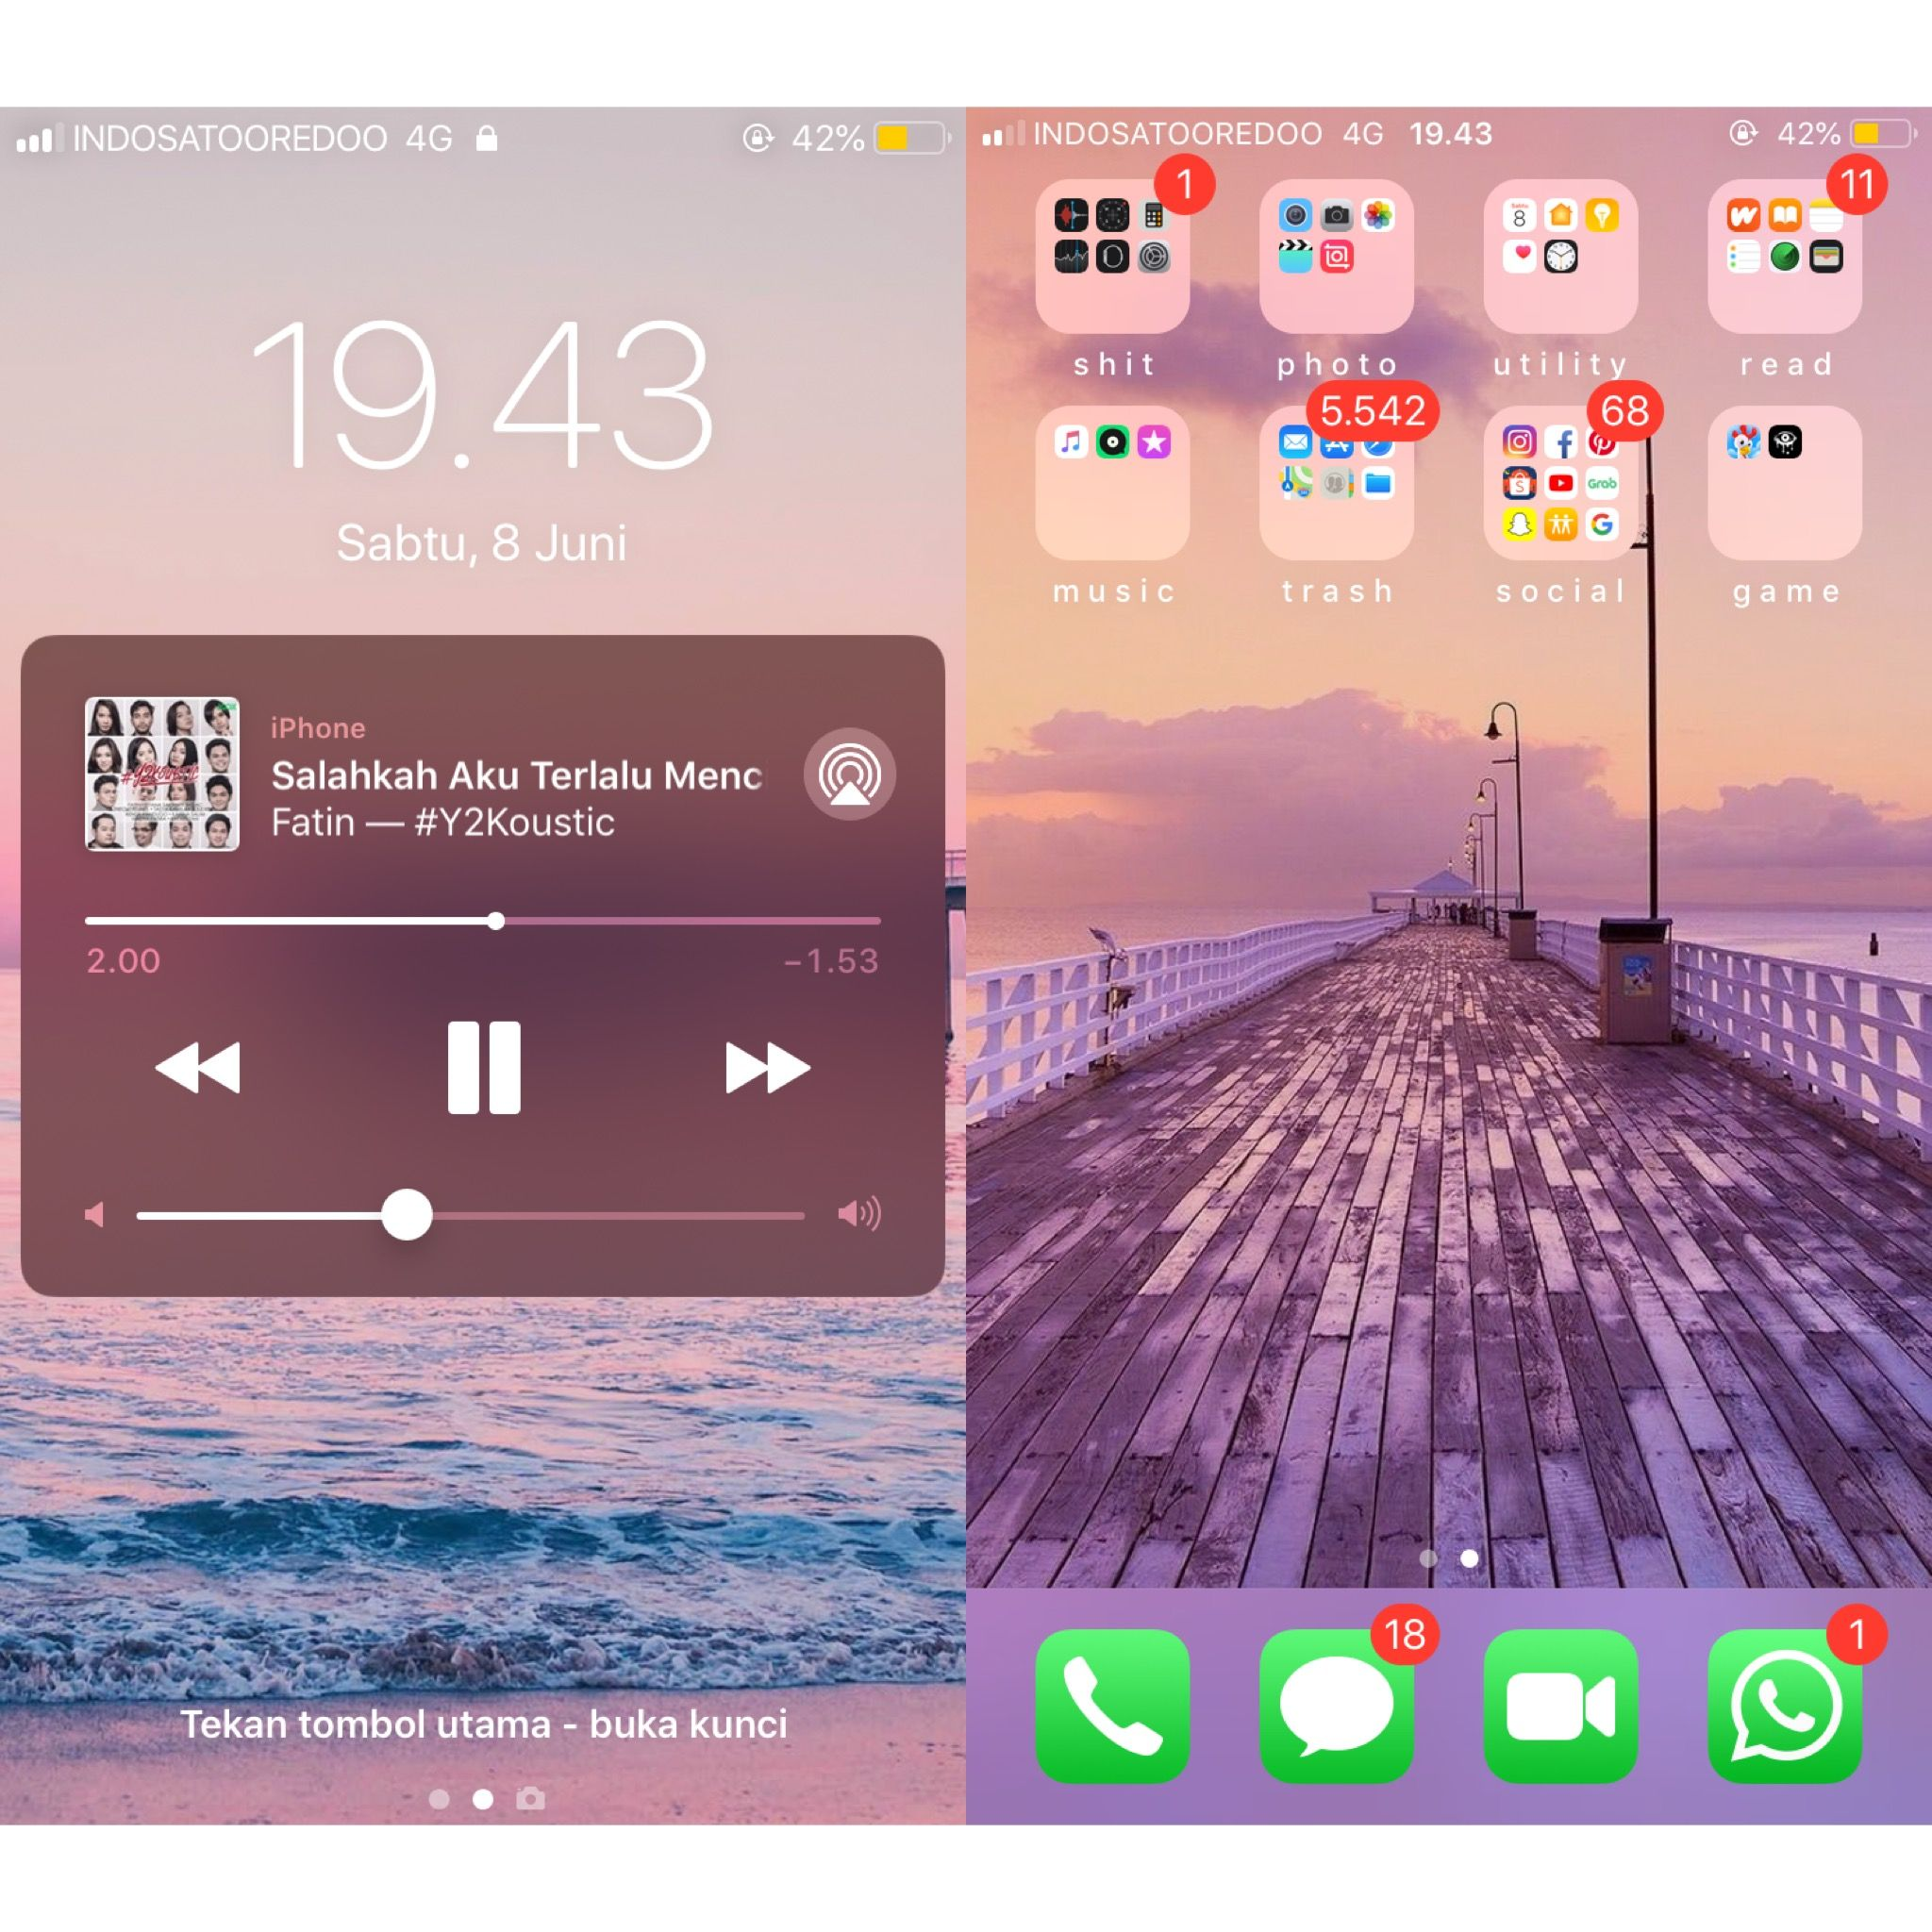 Ide Tata Letak Aplikasi For Iphone Tata Letak Iphone Aplikasi Iphone